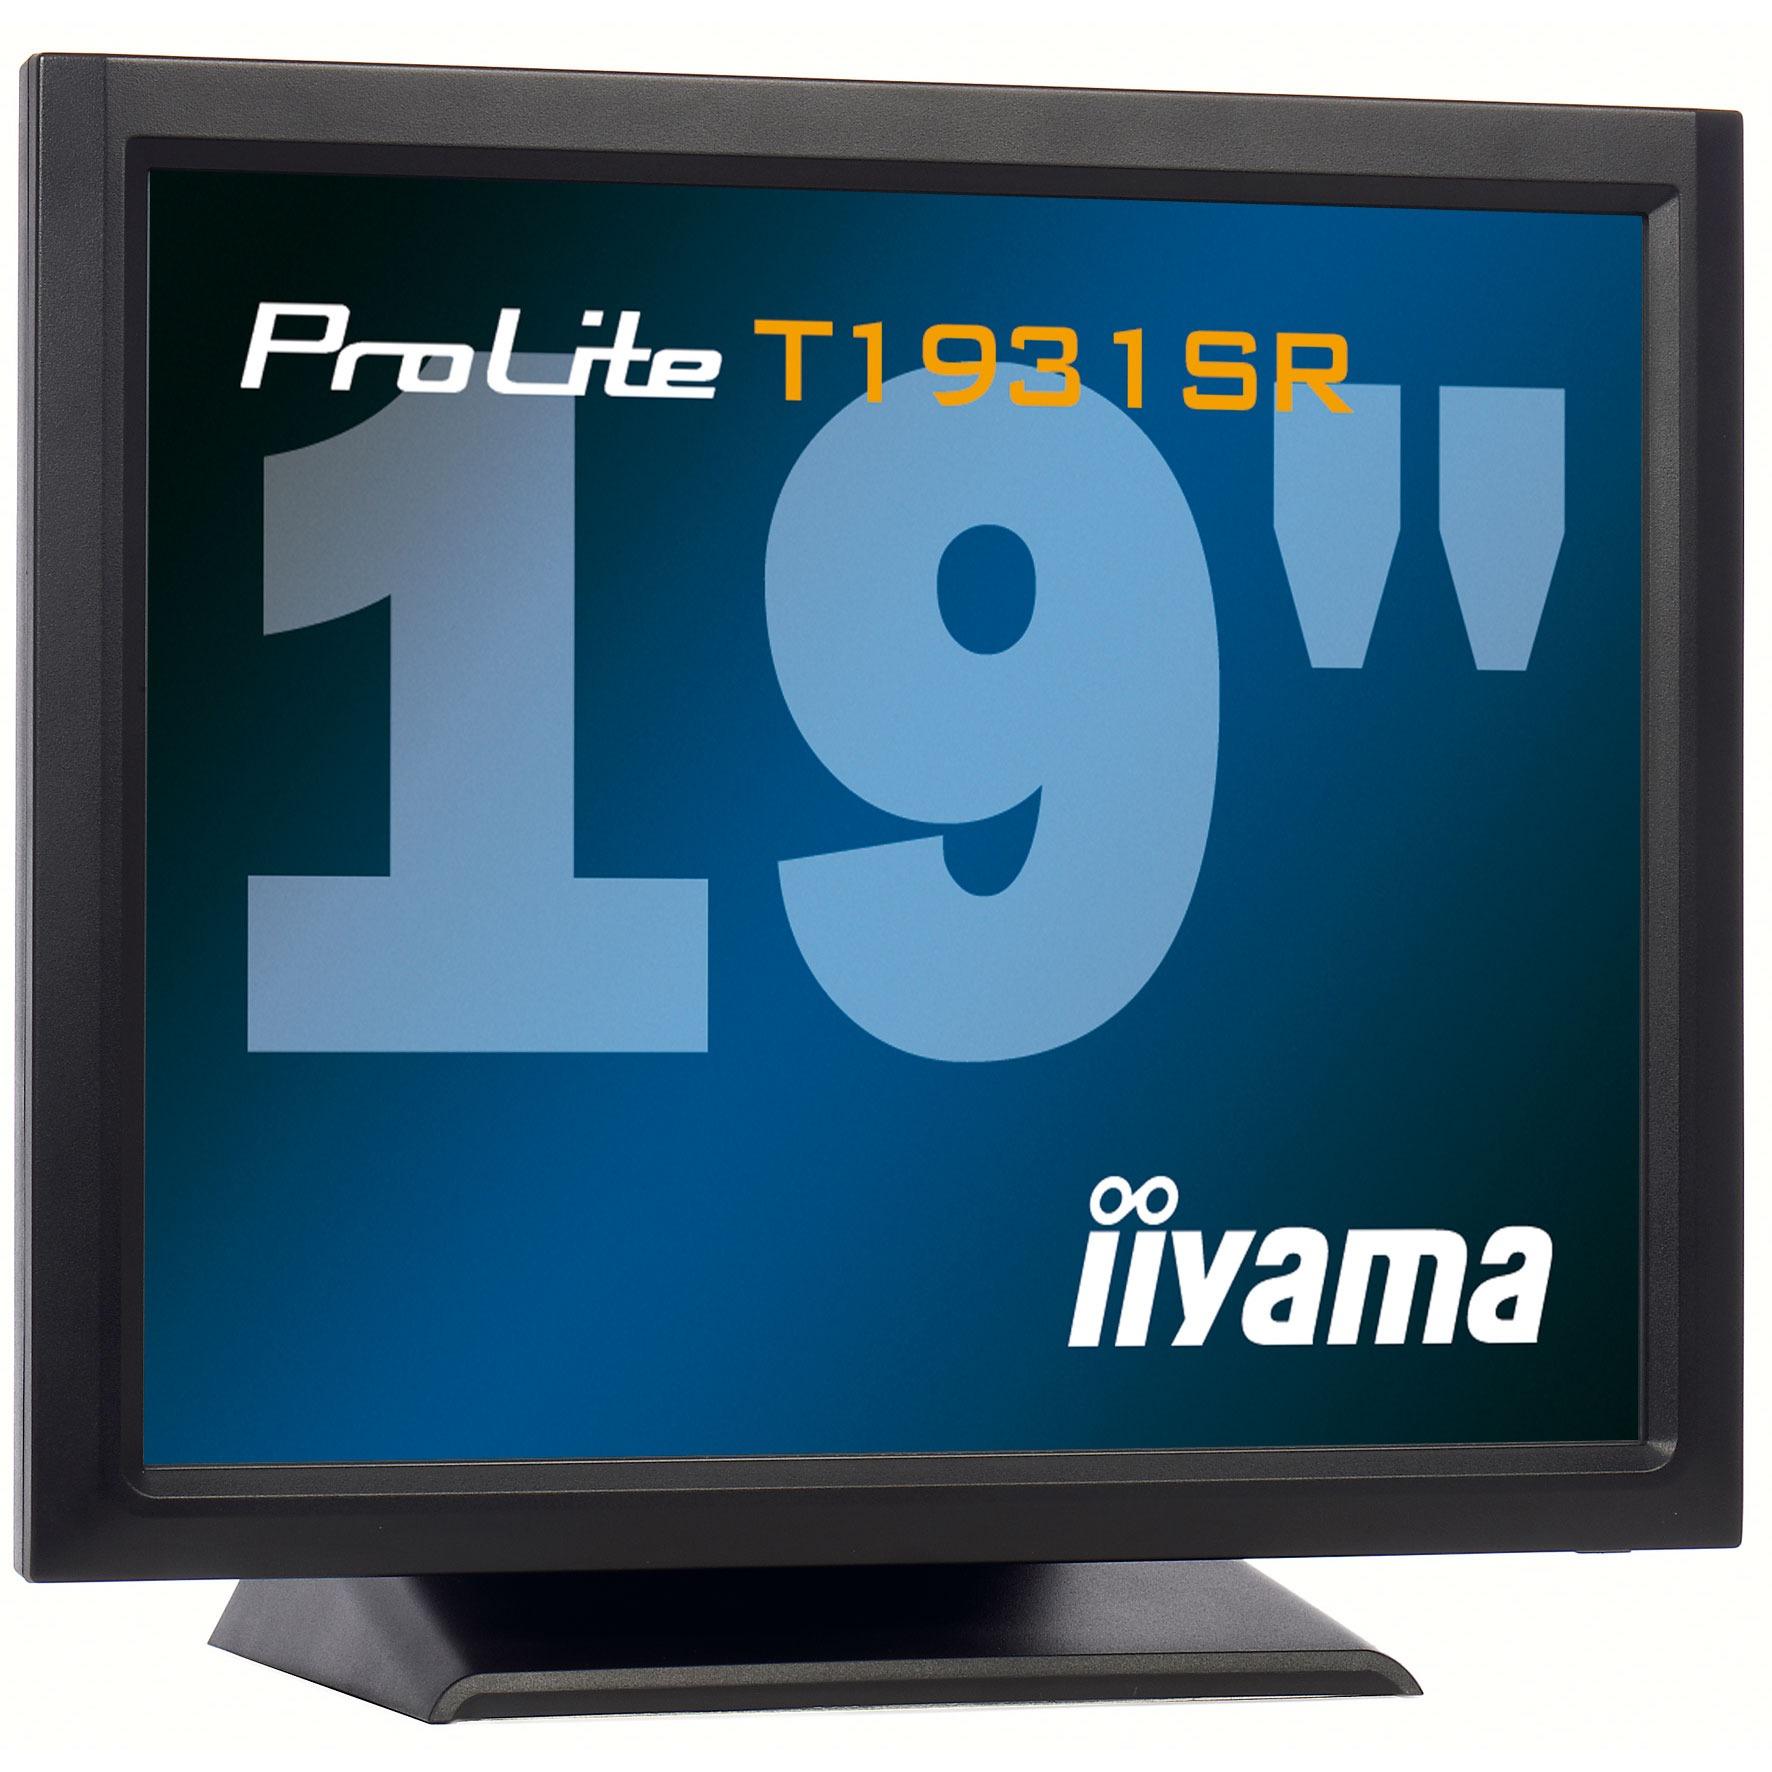 "Ecran PC iiyama 19"" LCD Tactile - ProLite T1931SR-1 1280 x 1024 pixels - 5 ms - Format 4/3 - Noir"